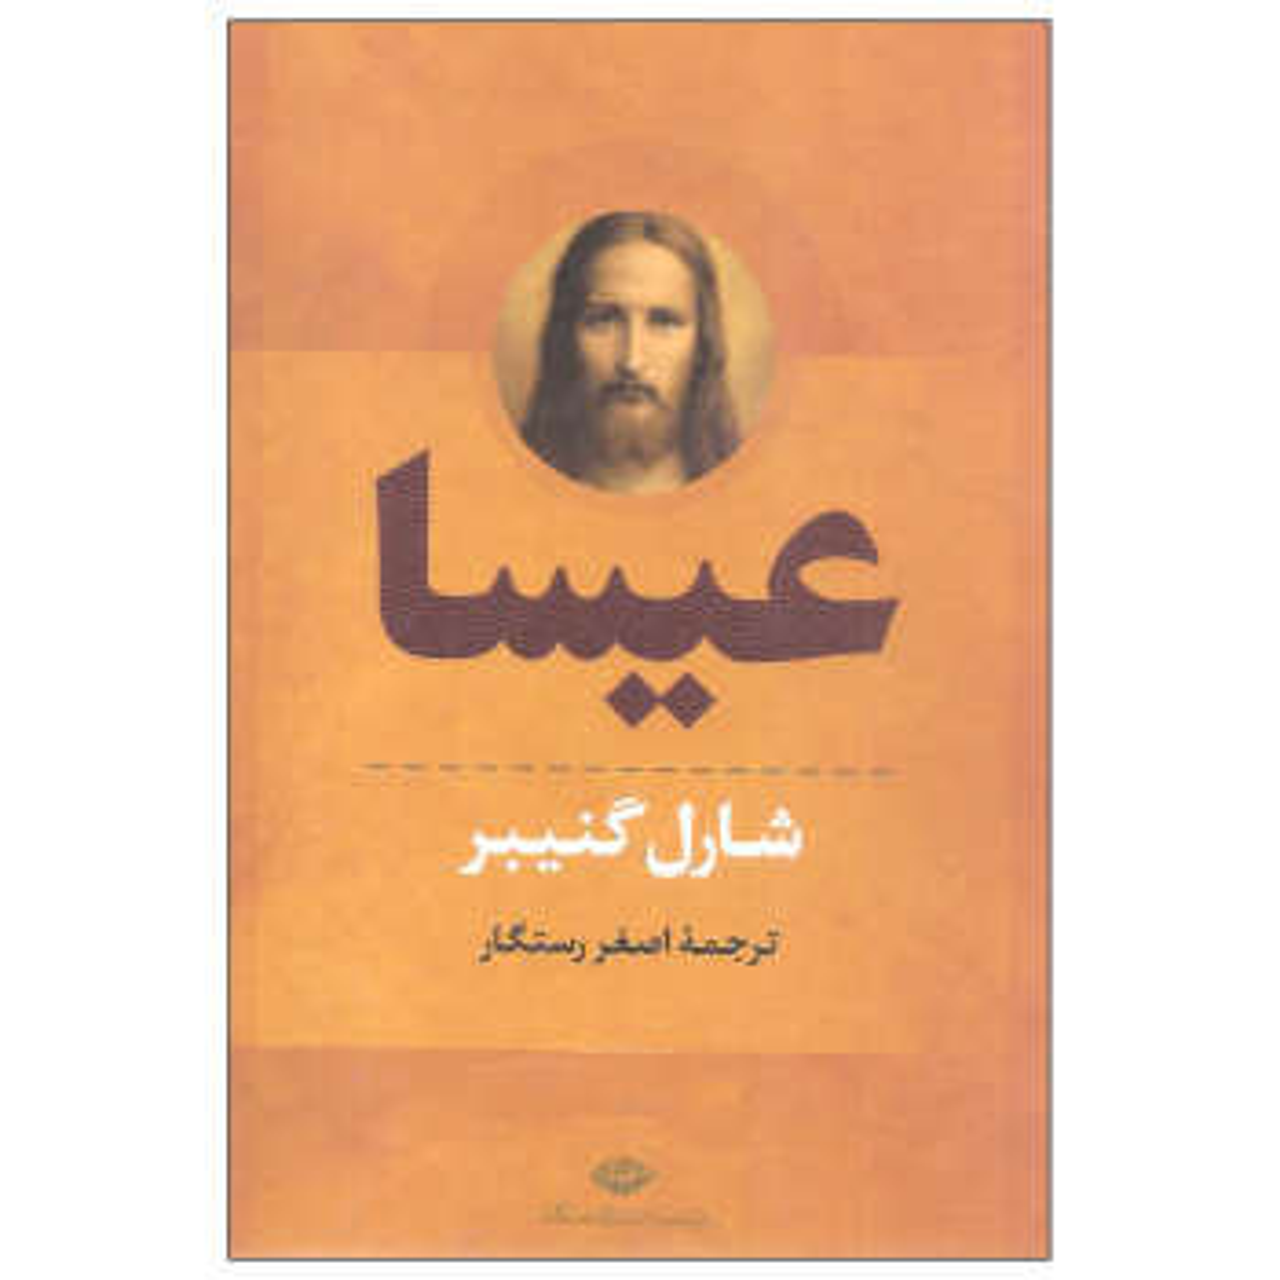 کتاب عیسا اثر شارل گنیبر نشر نگاه دوره دو جلدی